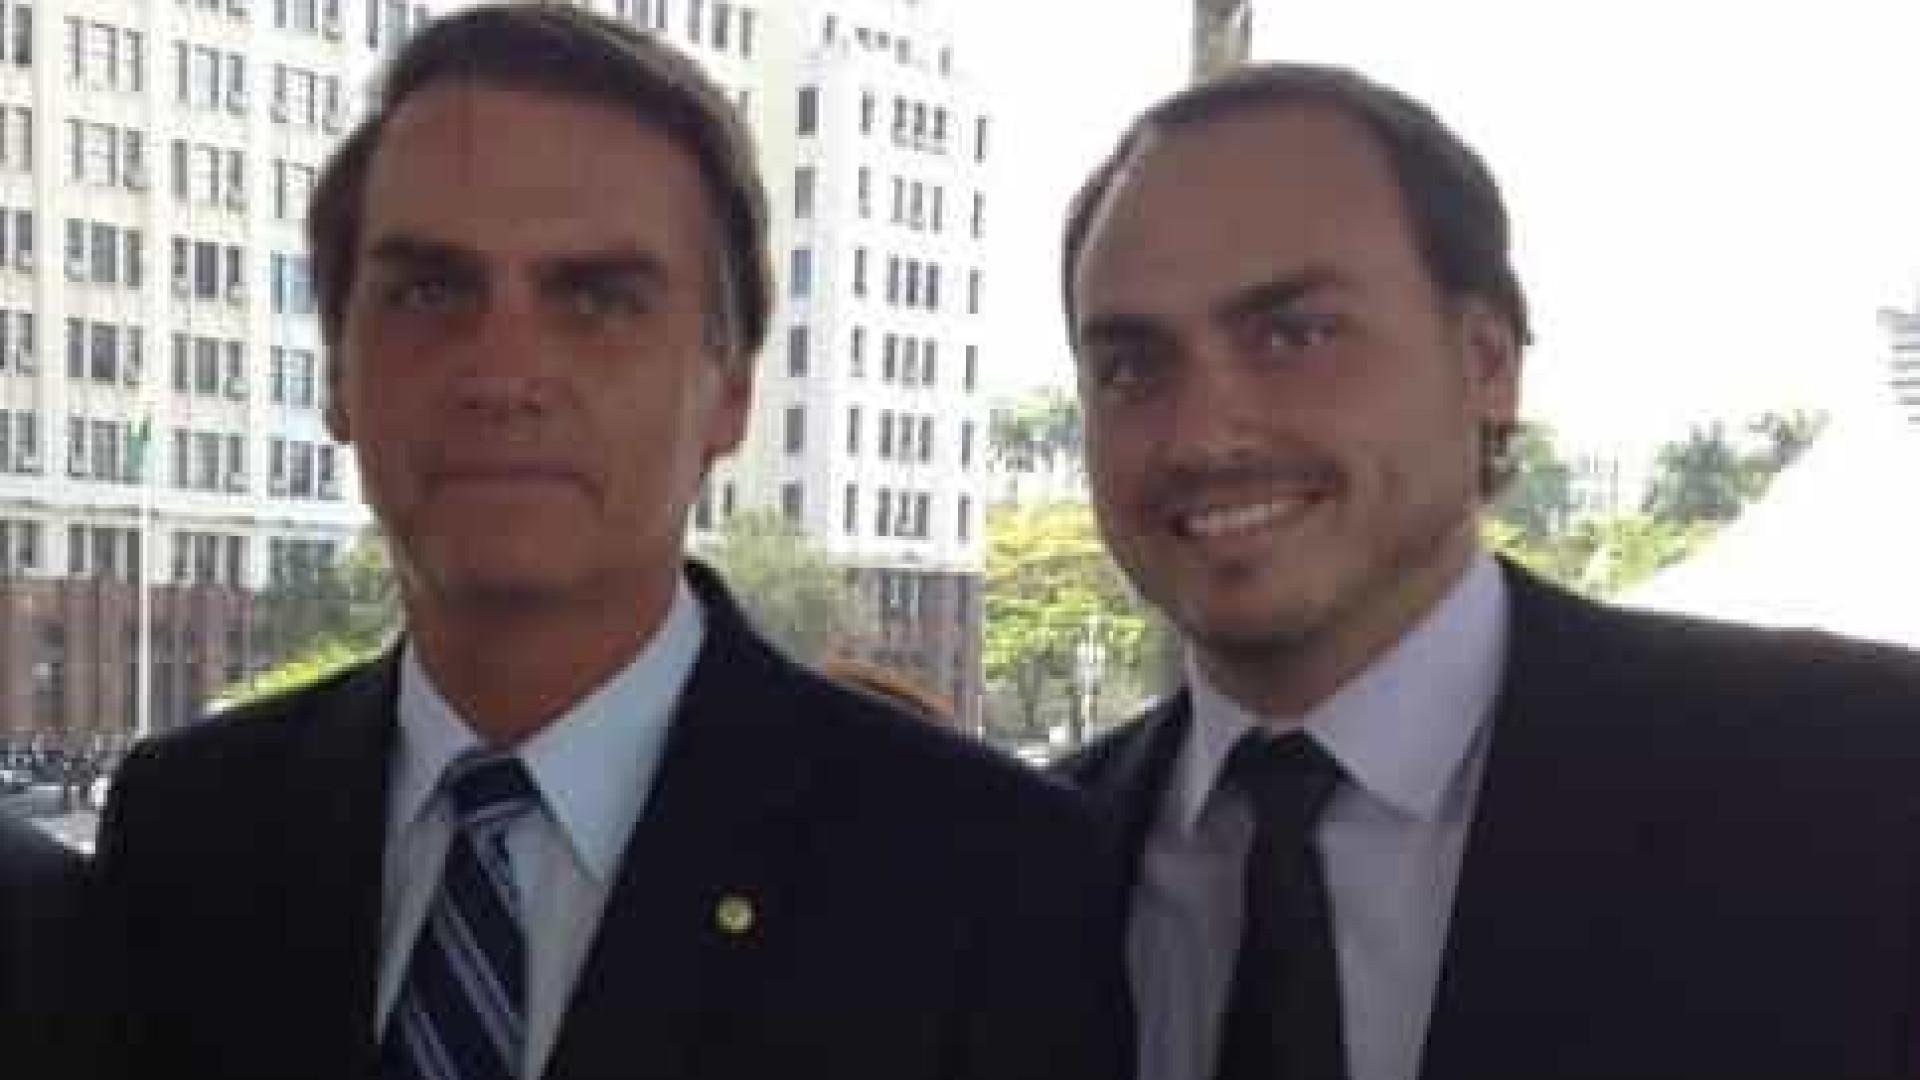 Carlos Bolsonaro tenta retomar influência no governo